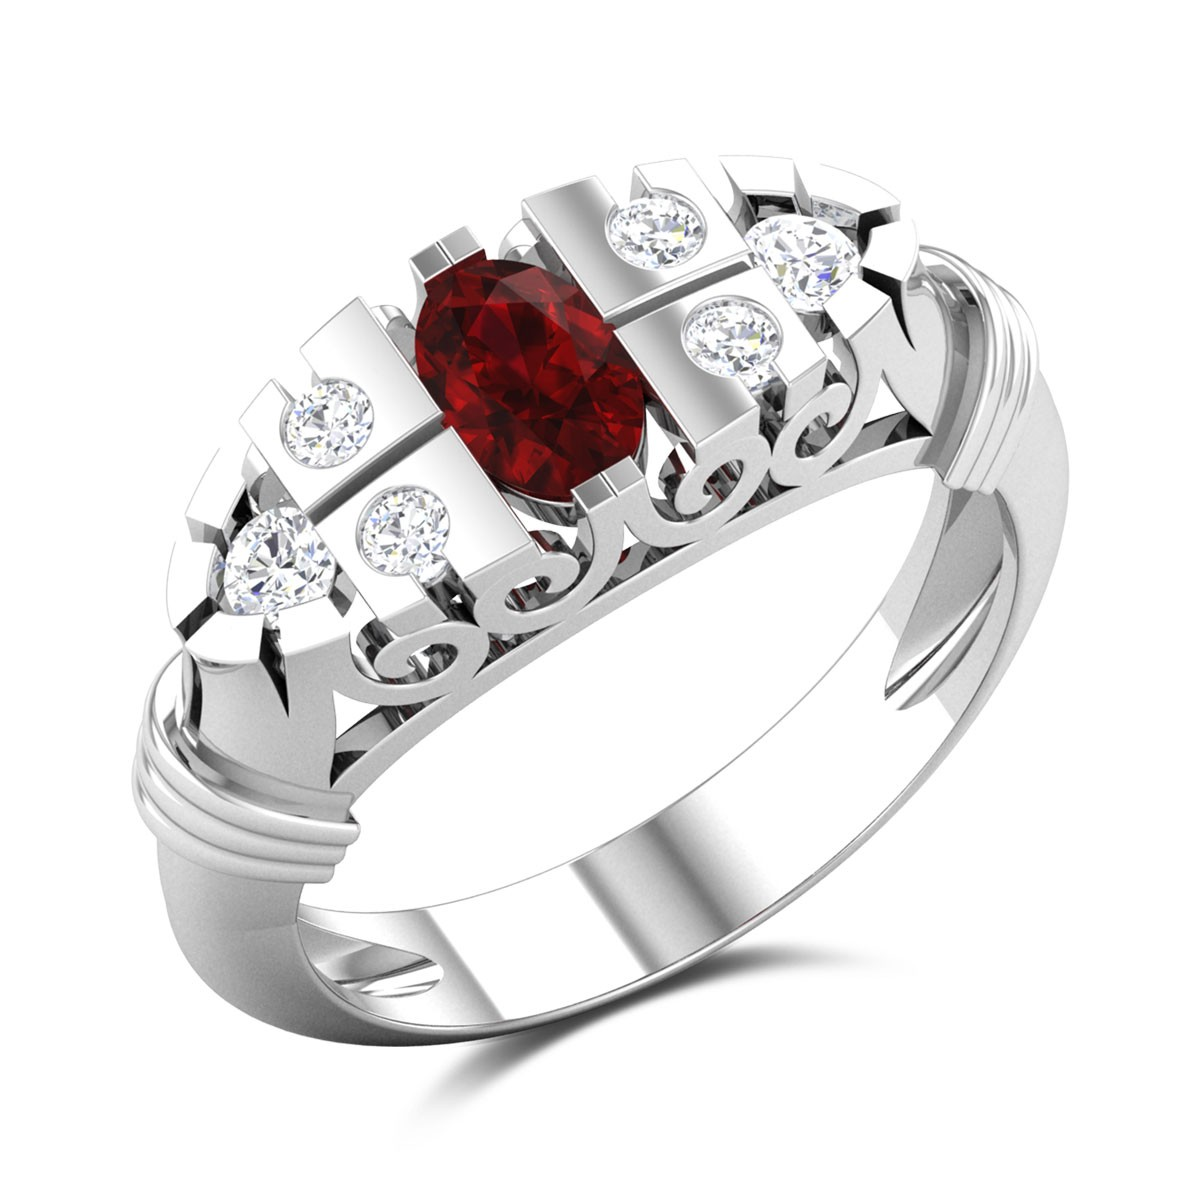 Mythical Magic Diamond Ring